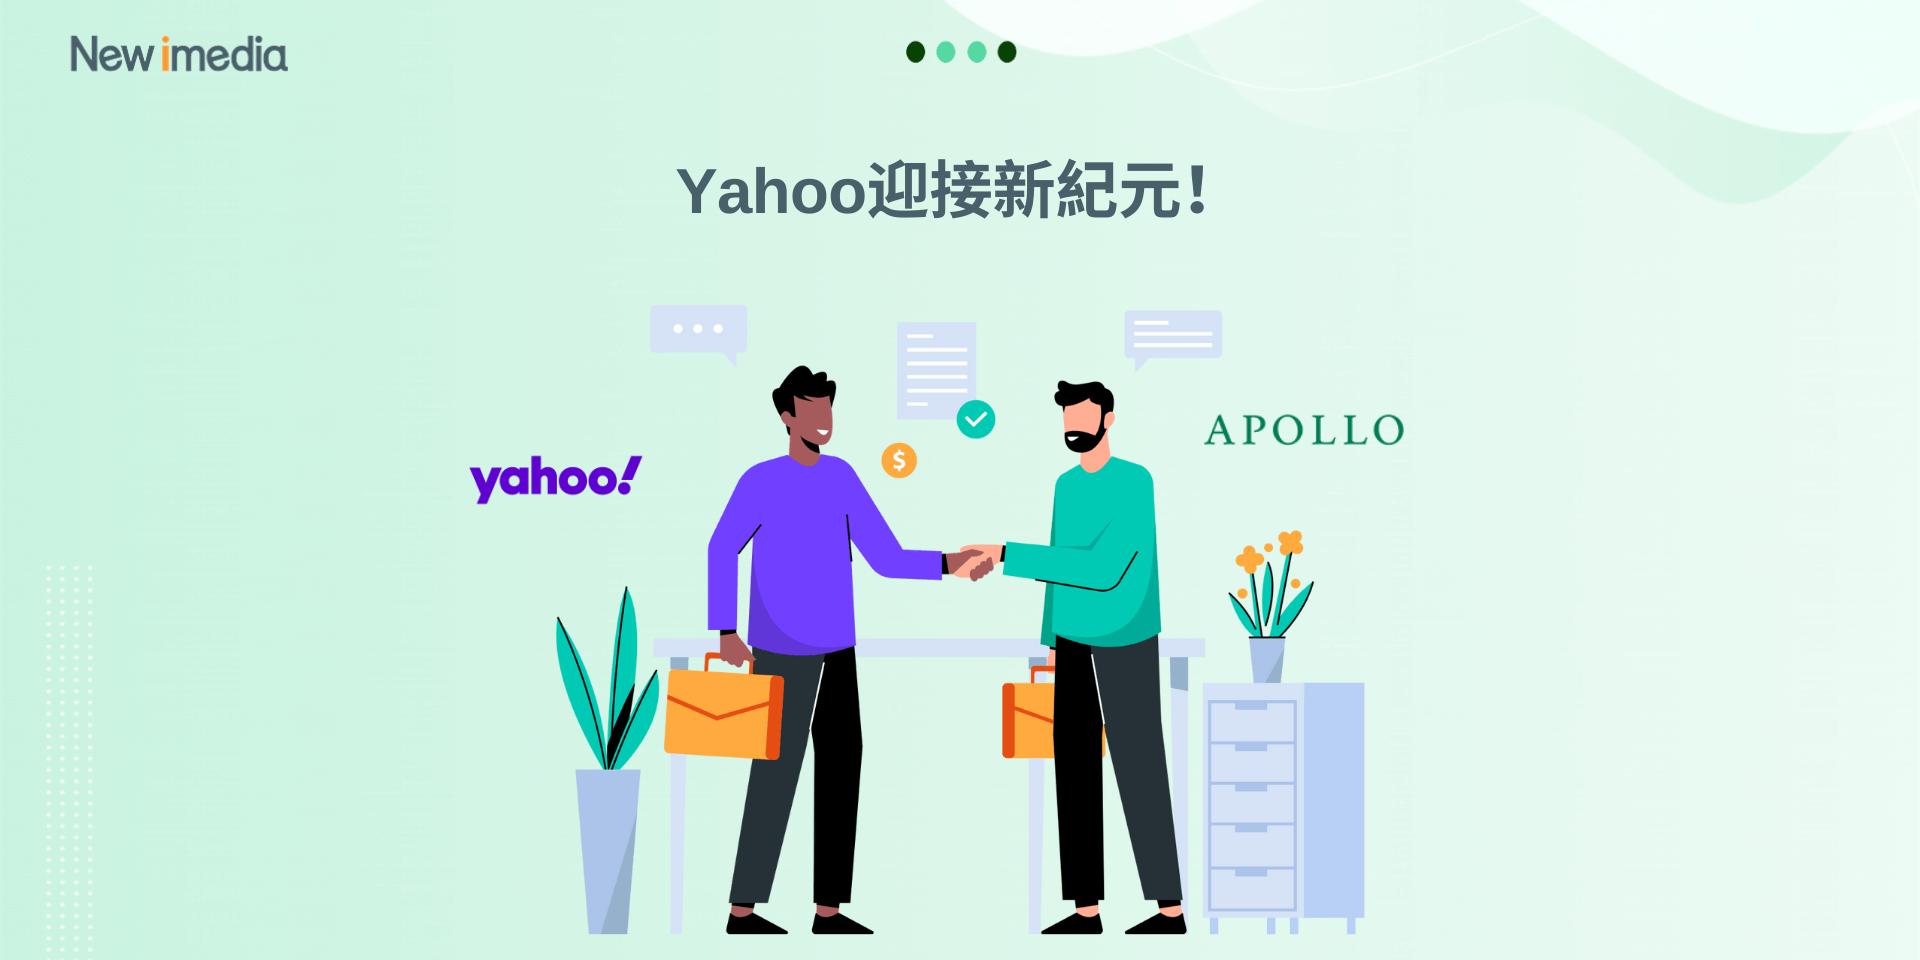 Yahoo迎接新紀元